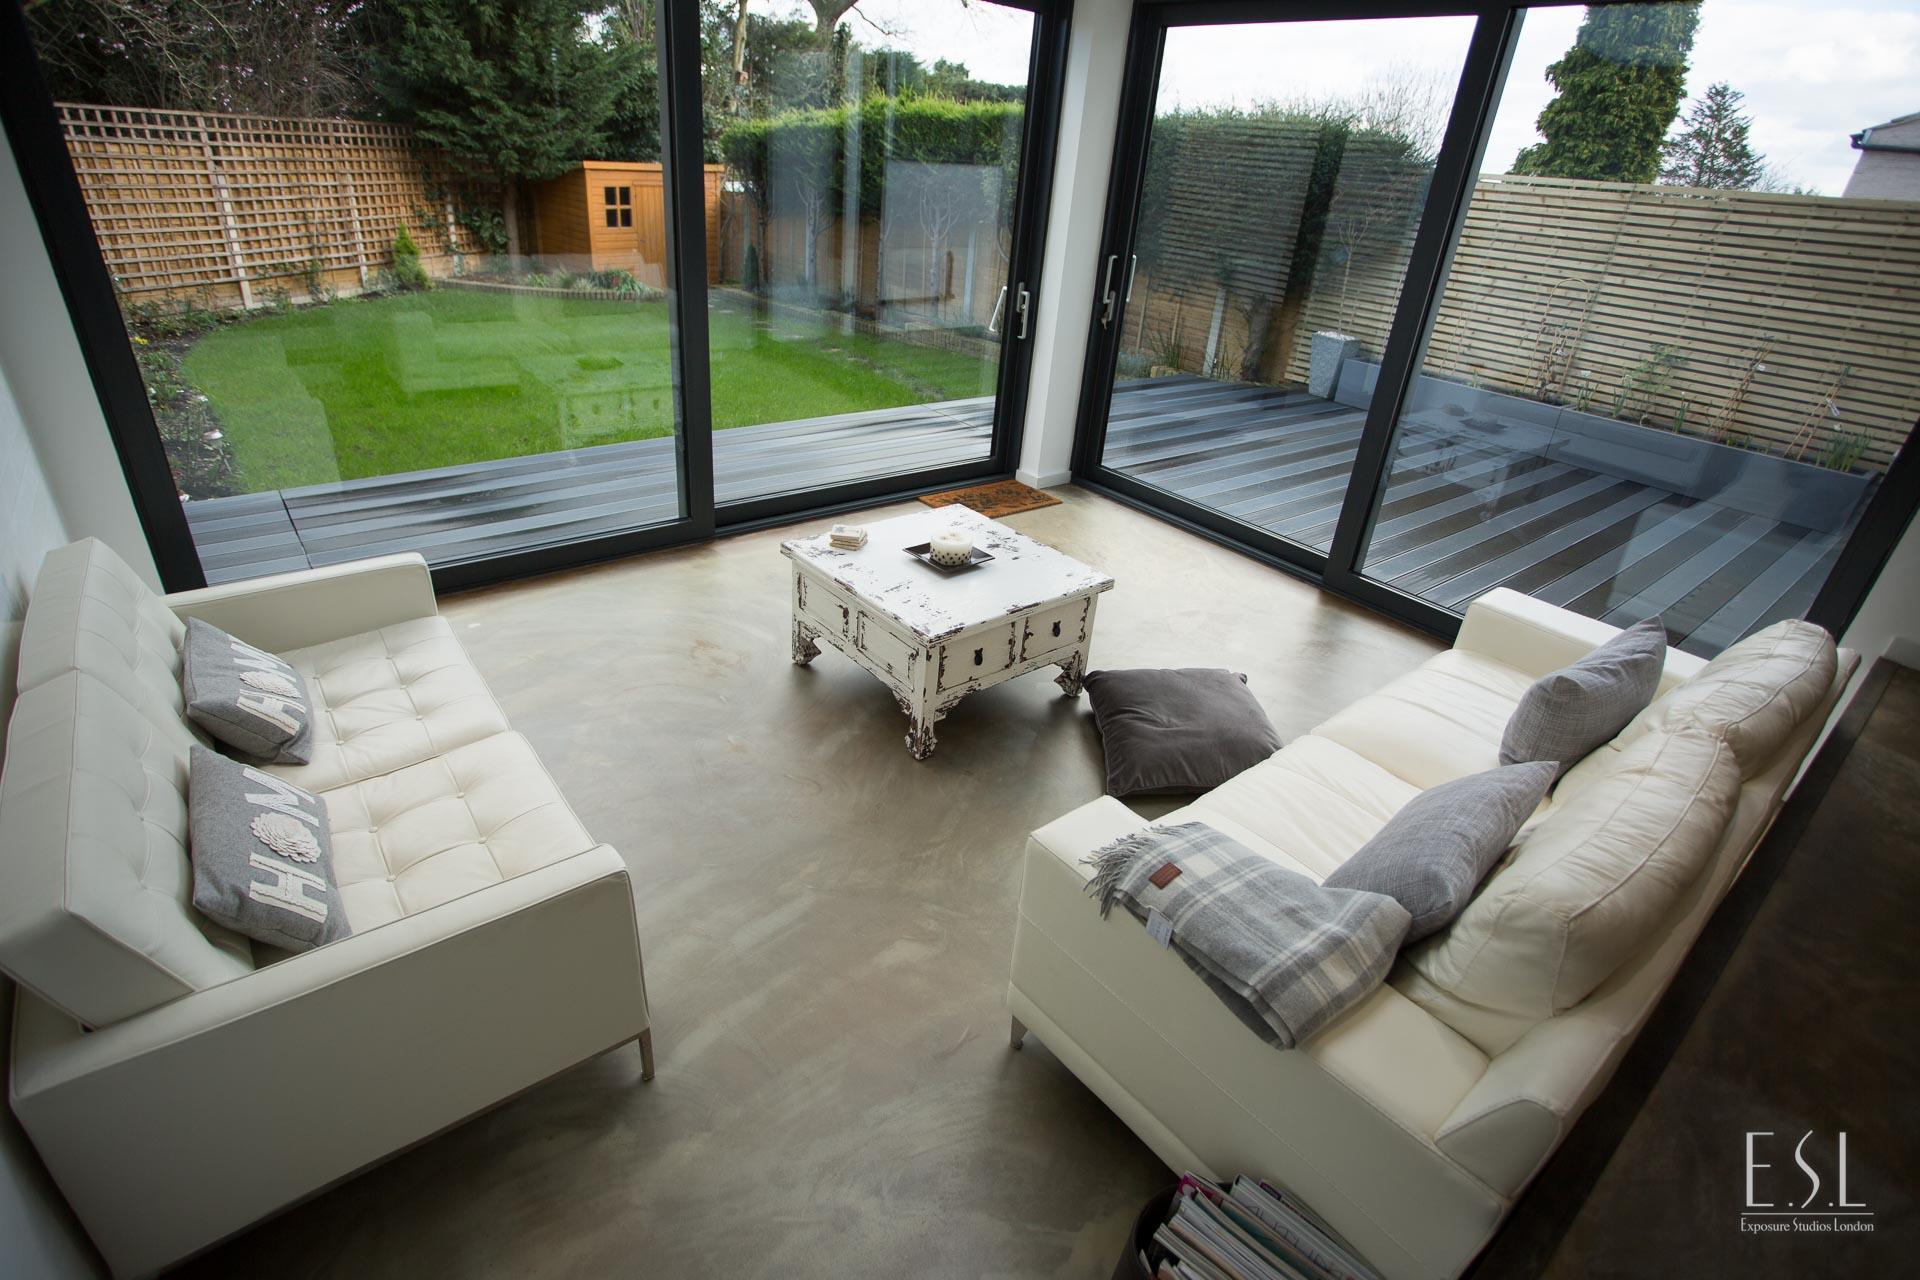 Builders, Winchmore Hill, London House rennovation & Refurbishment 22